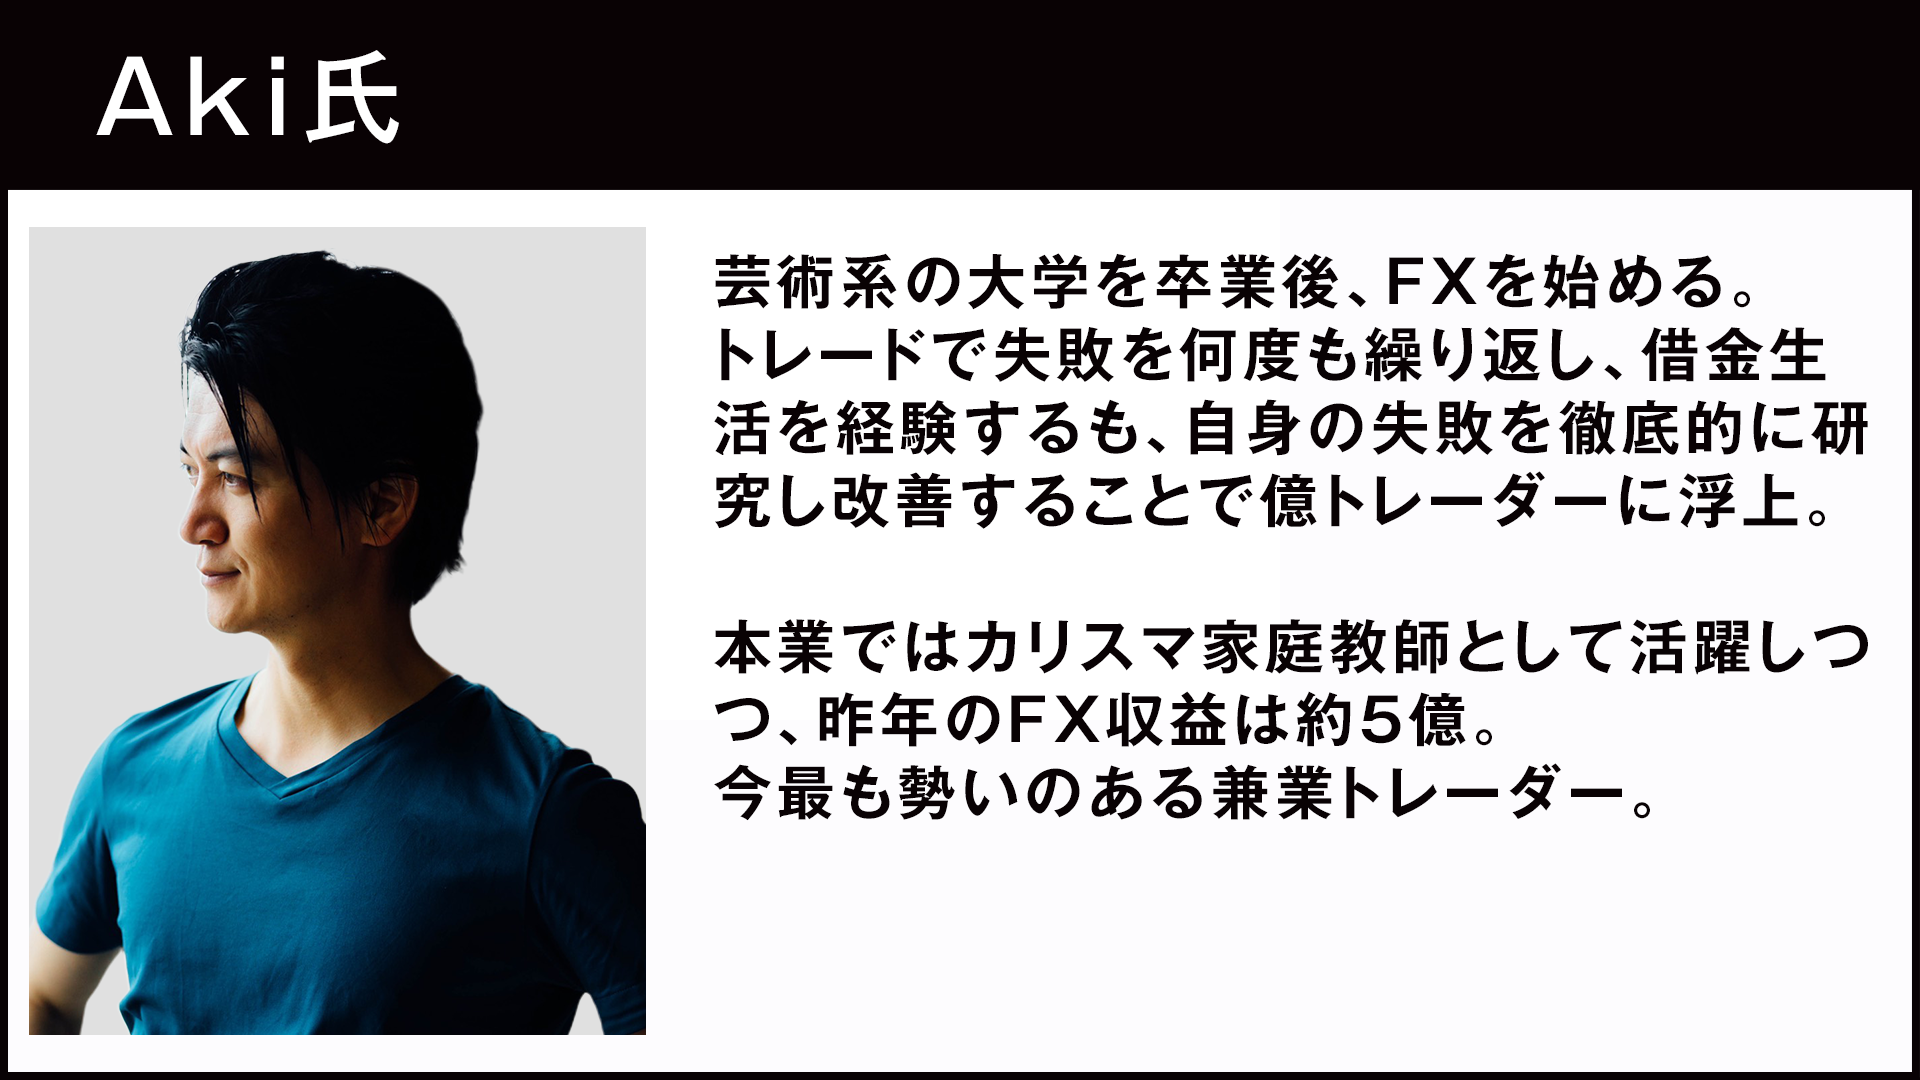 Aki氏顔写真